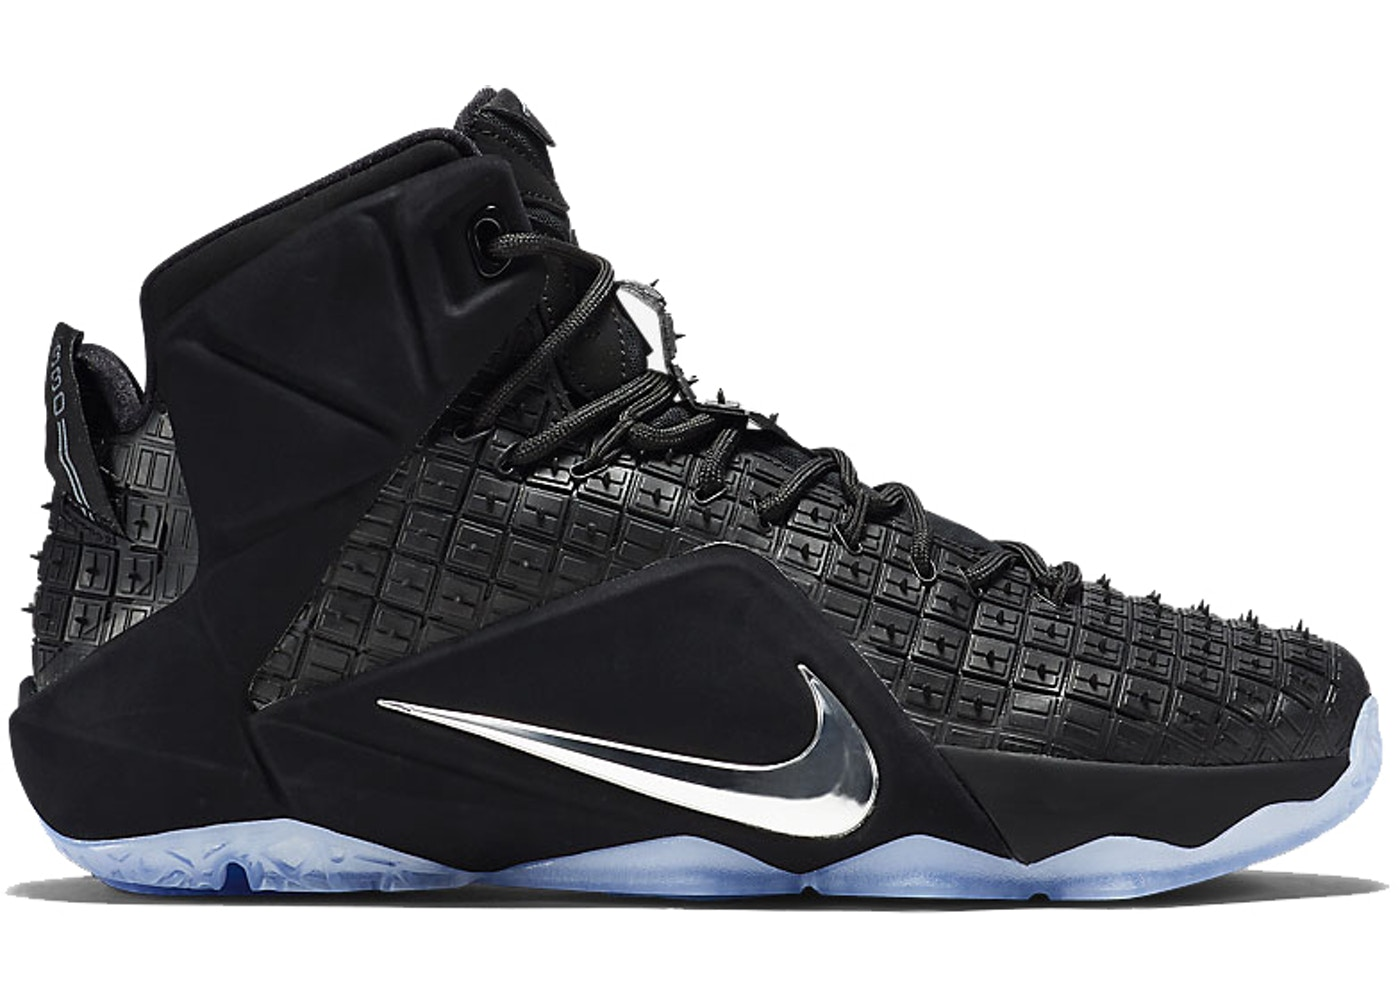 buy popular 13c96 0f39b Buy Nike LeBron 12 Shoes   Deadstock Sneakers